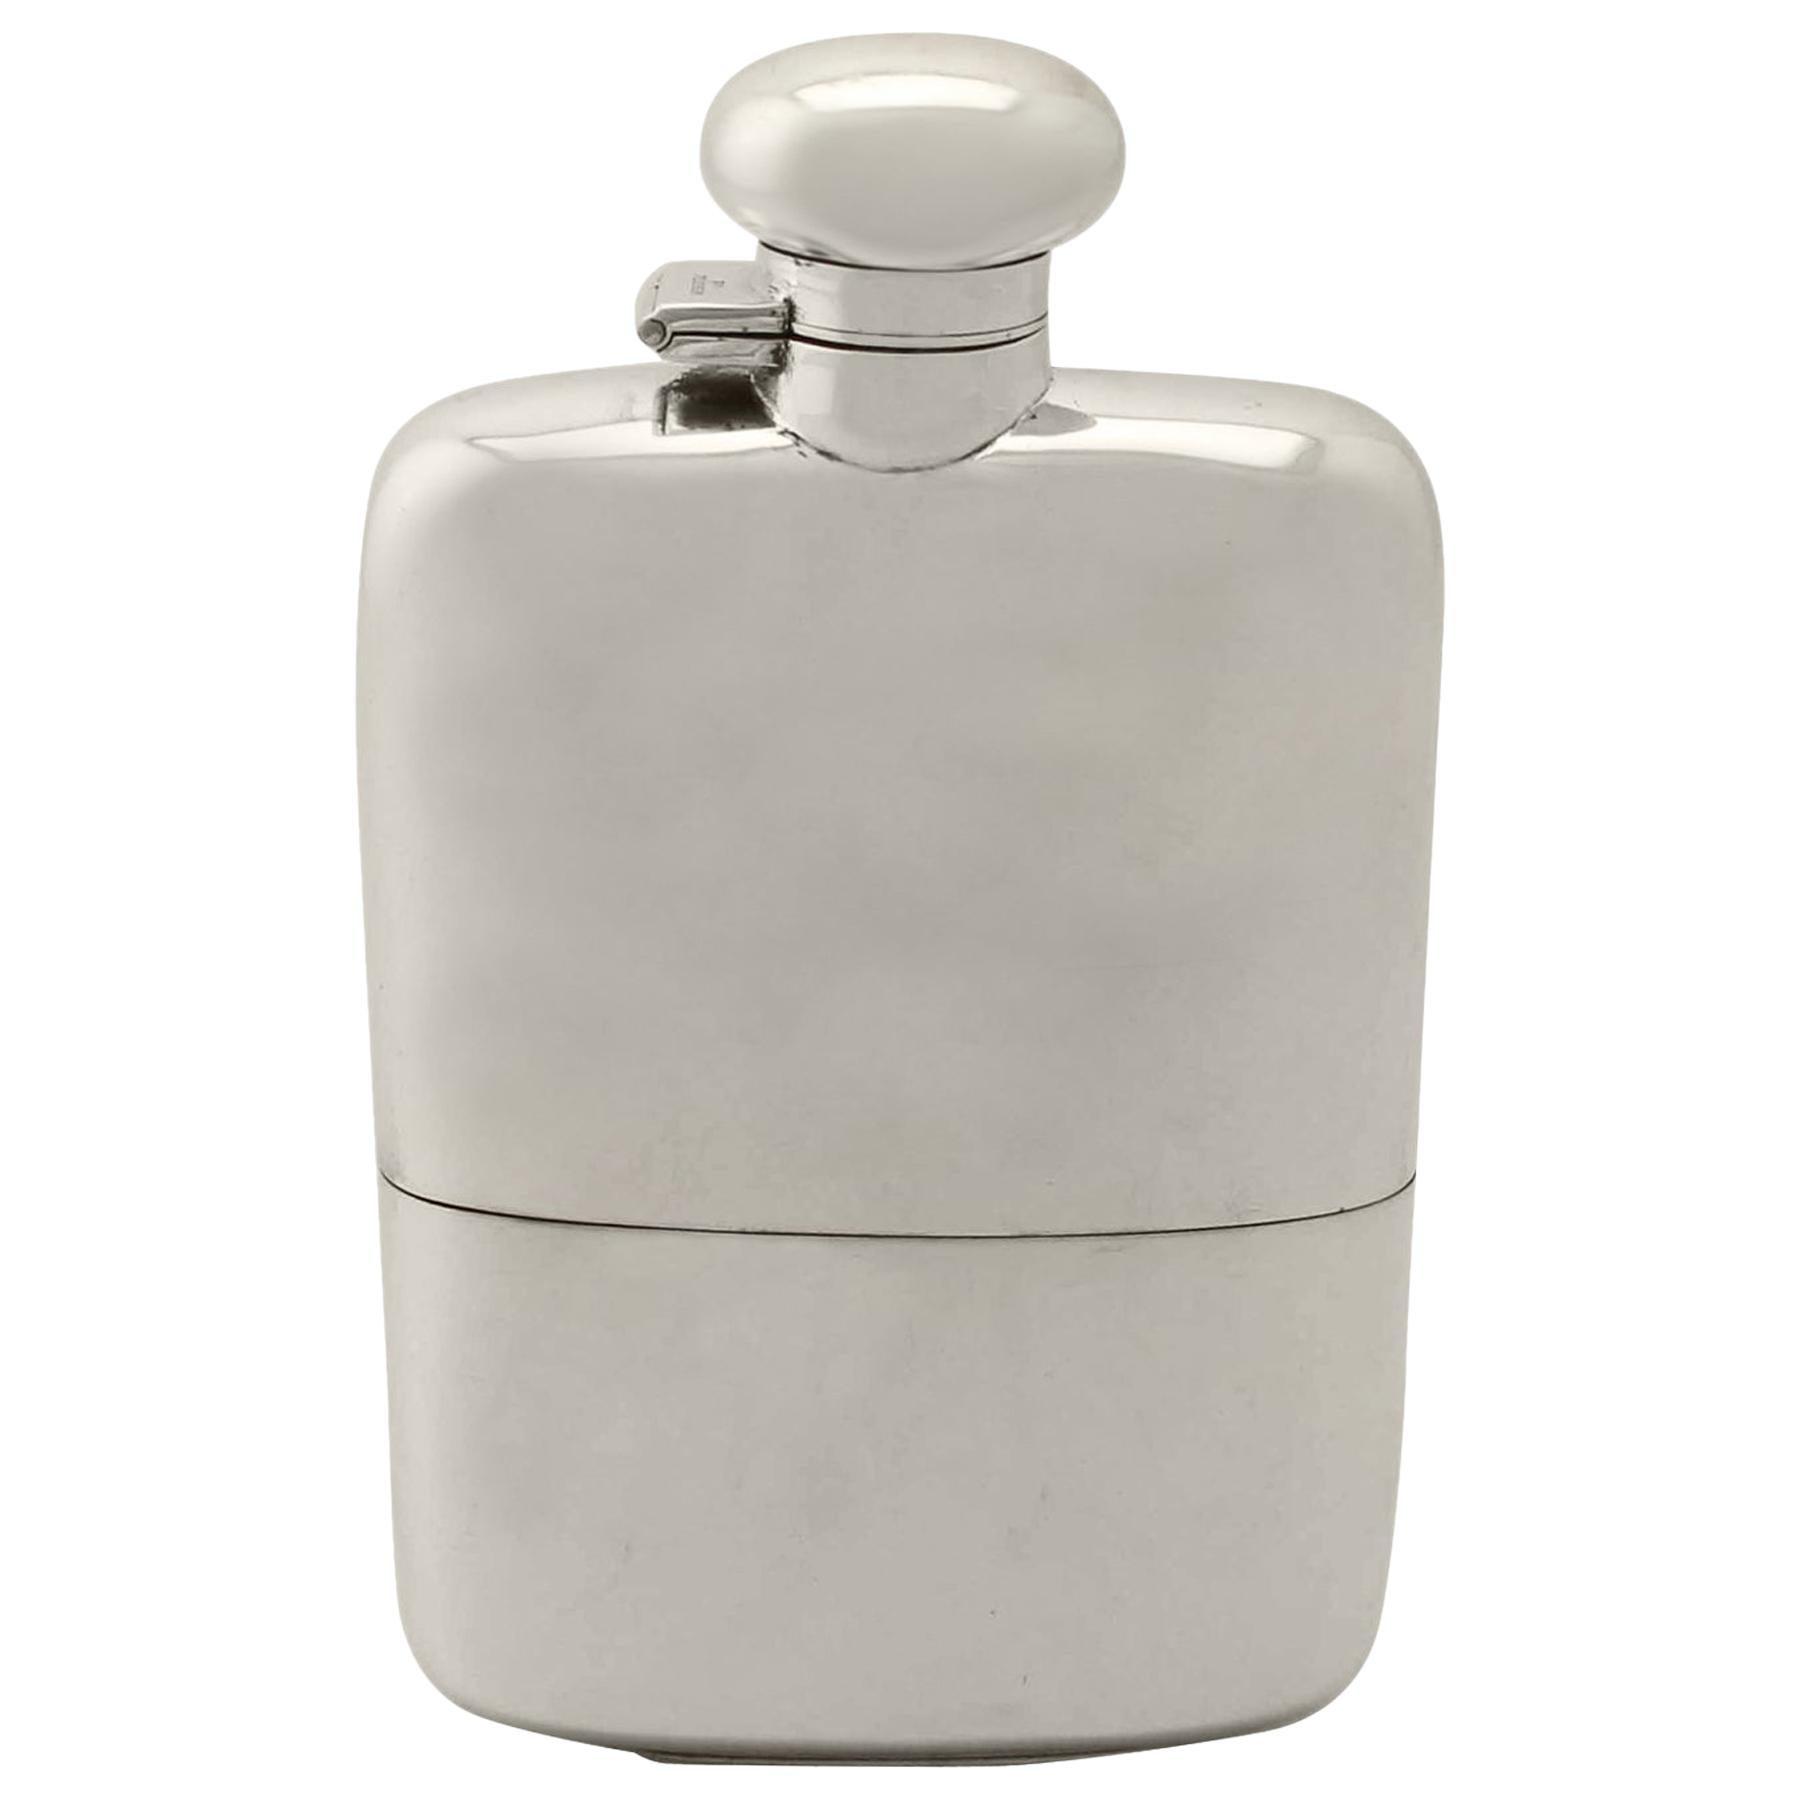 Antique George V Sterling Silver Hip Flask by Herbert Hall, 1932